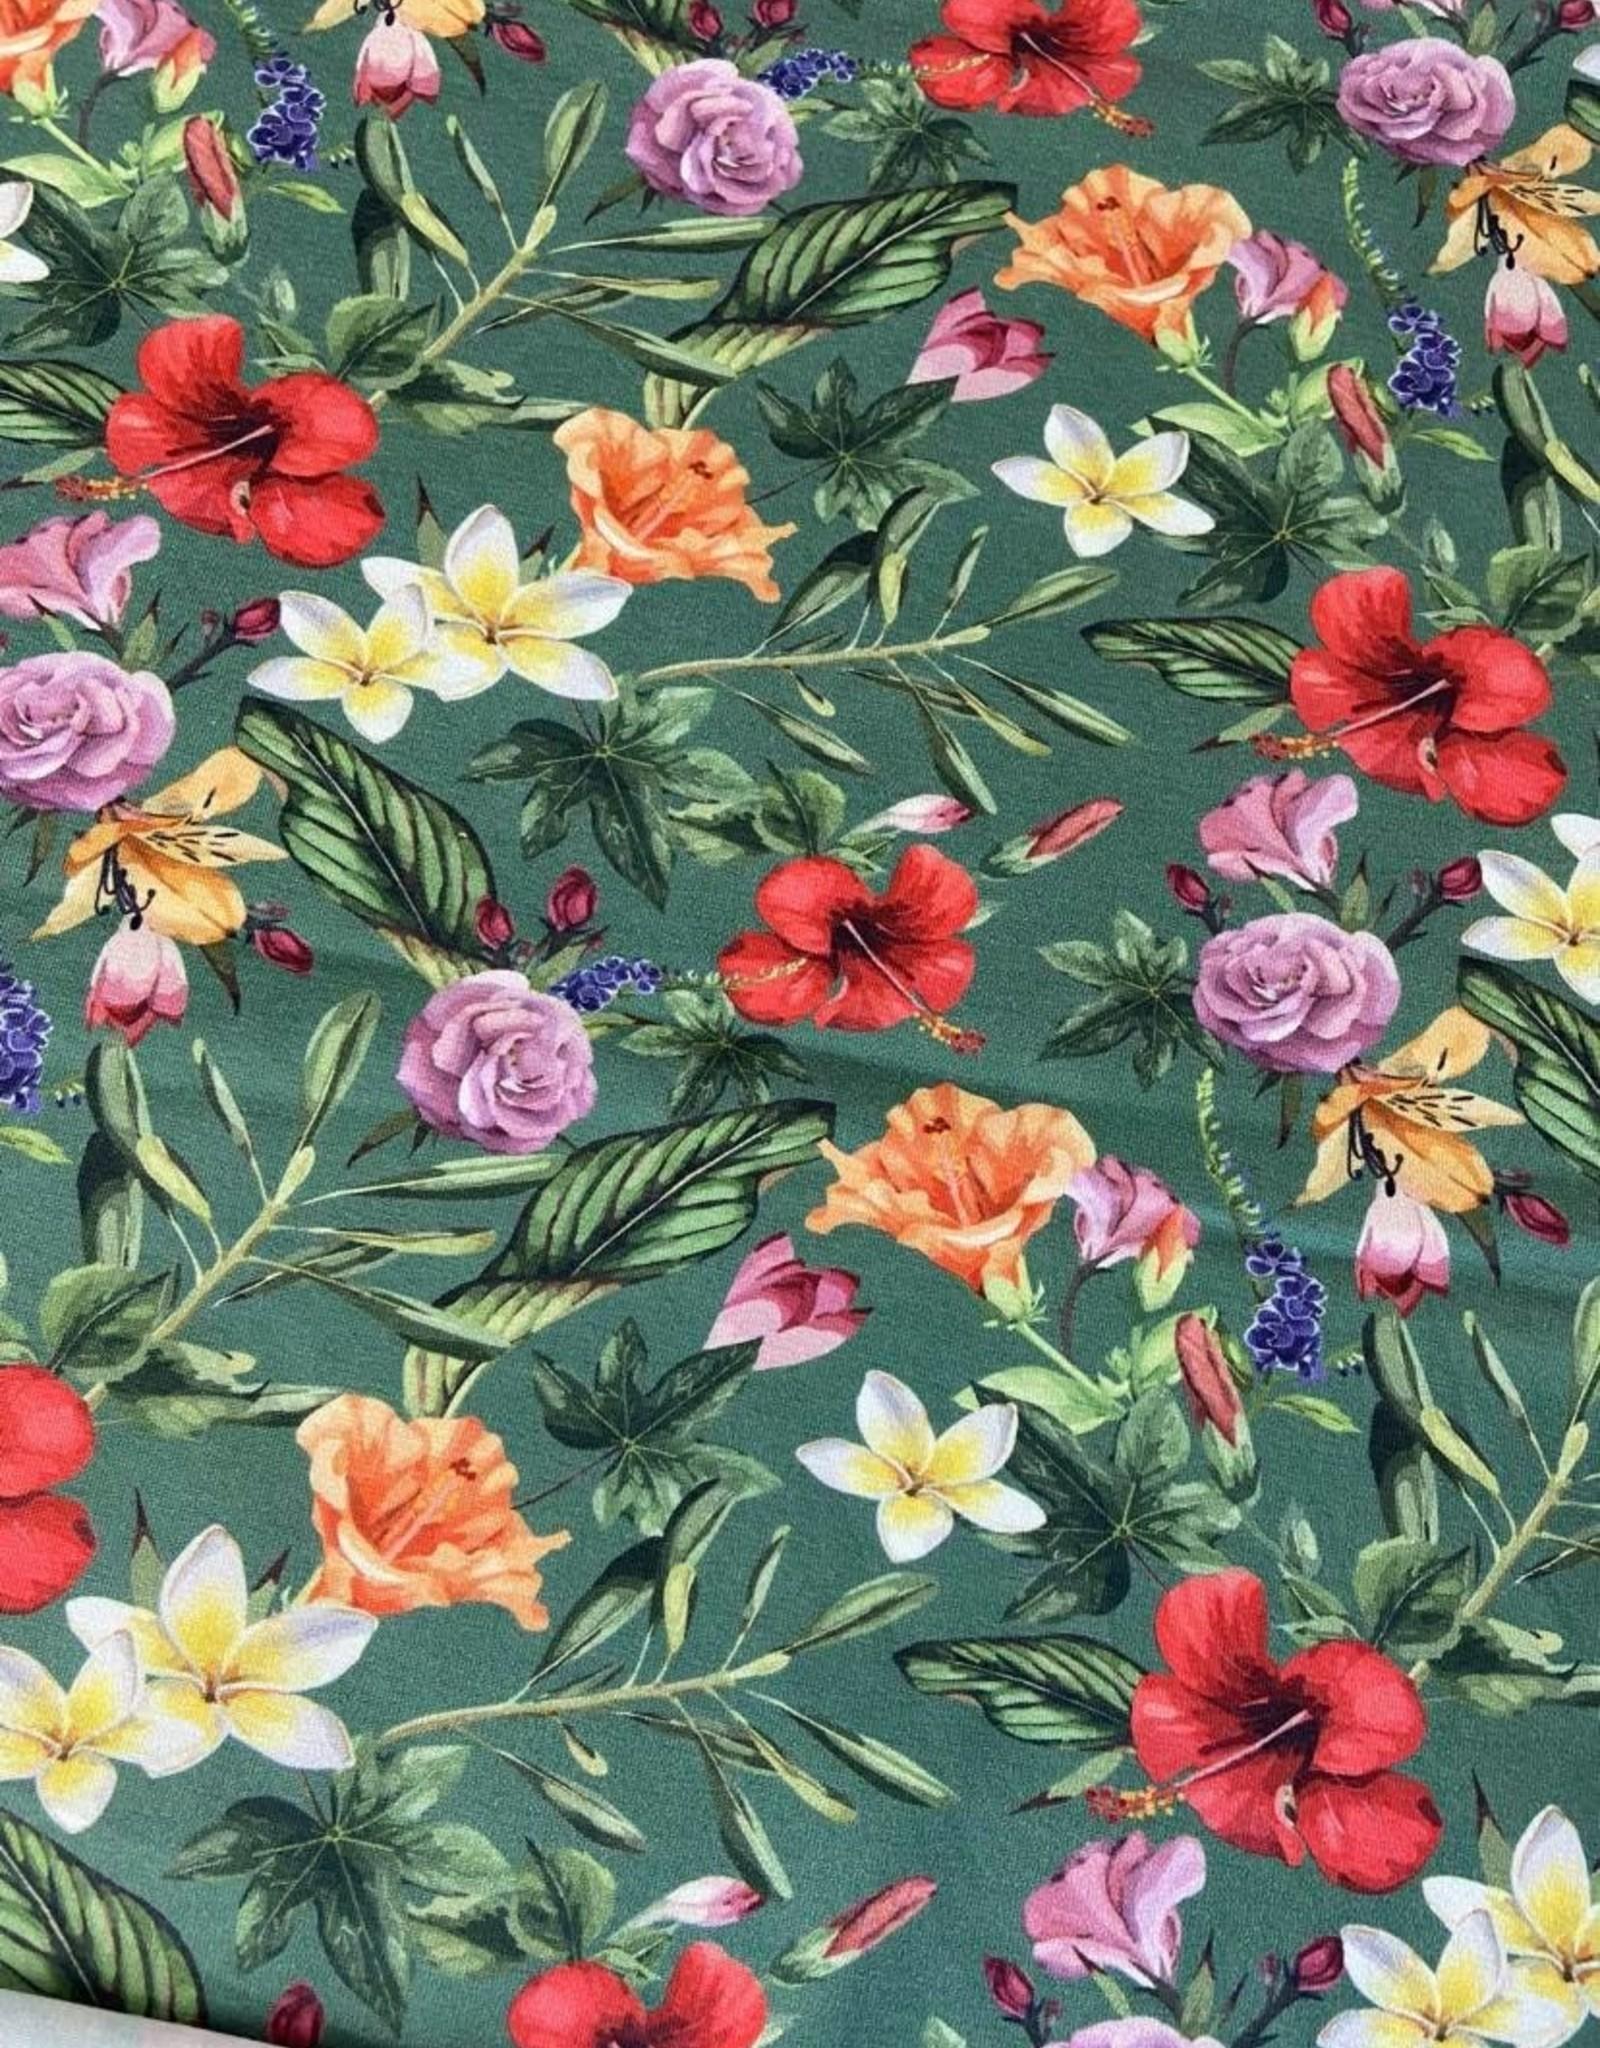 Megan Blue Old green bloem jersey